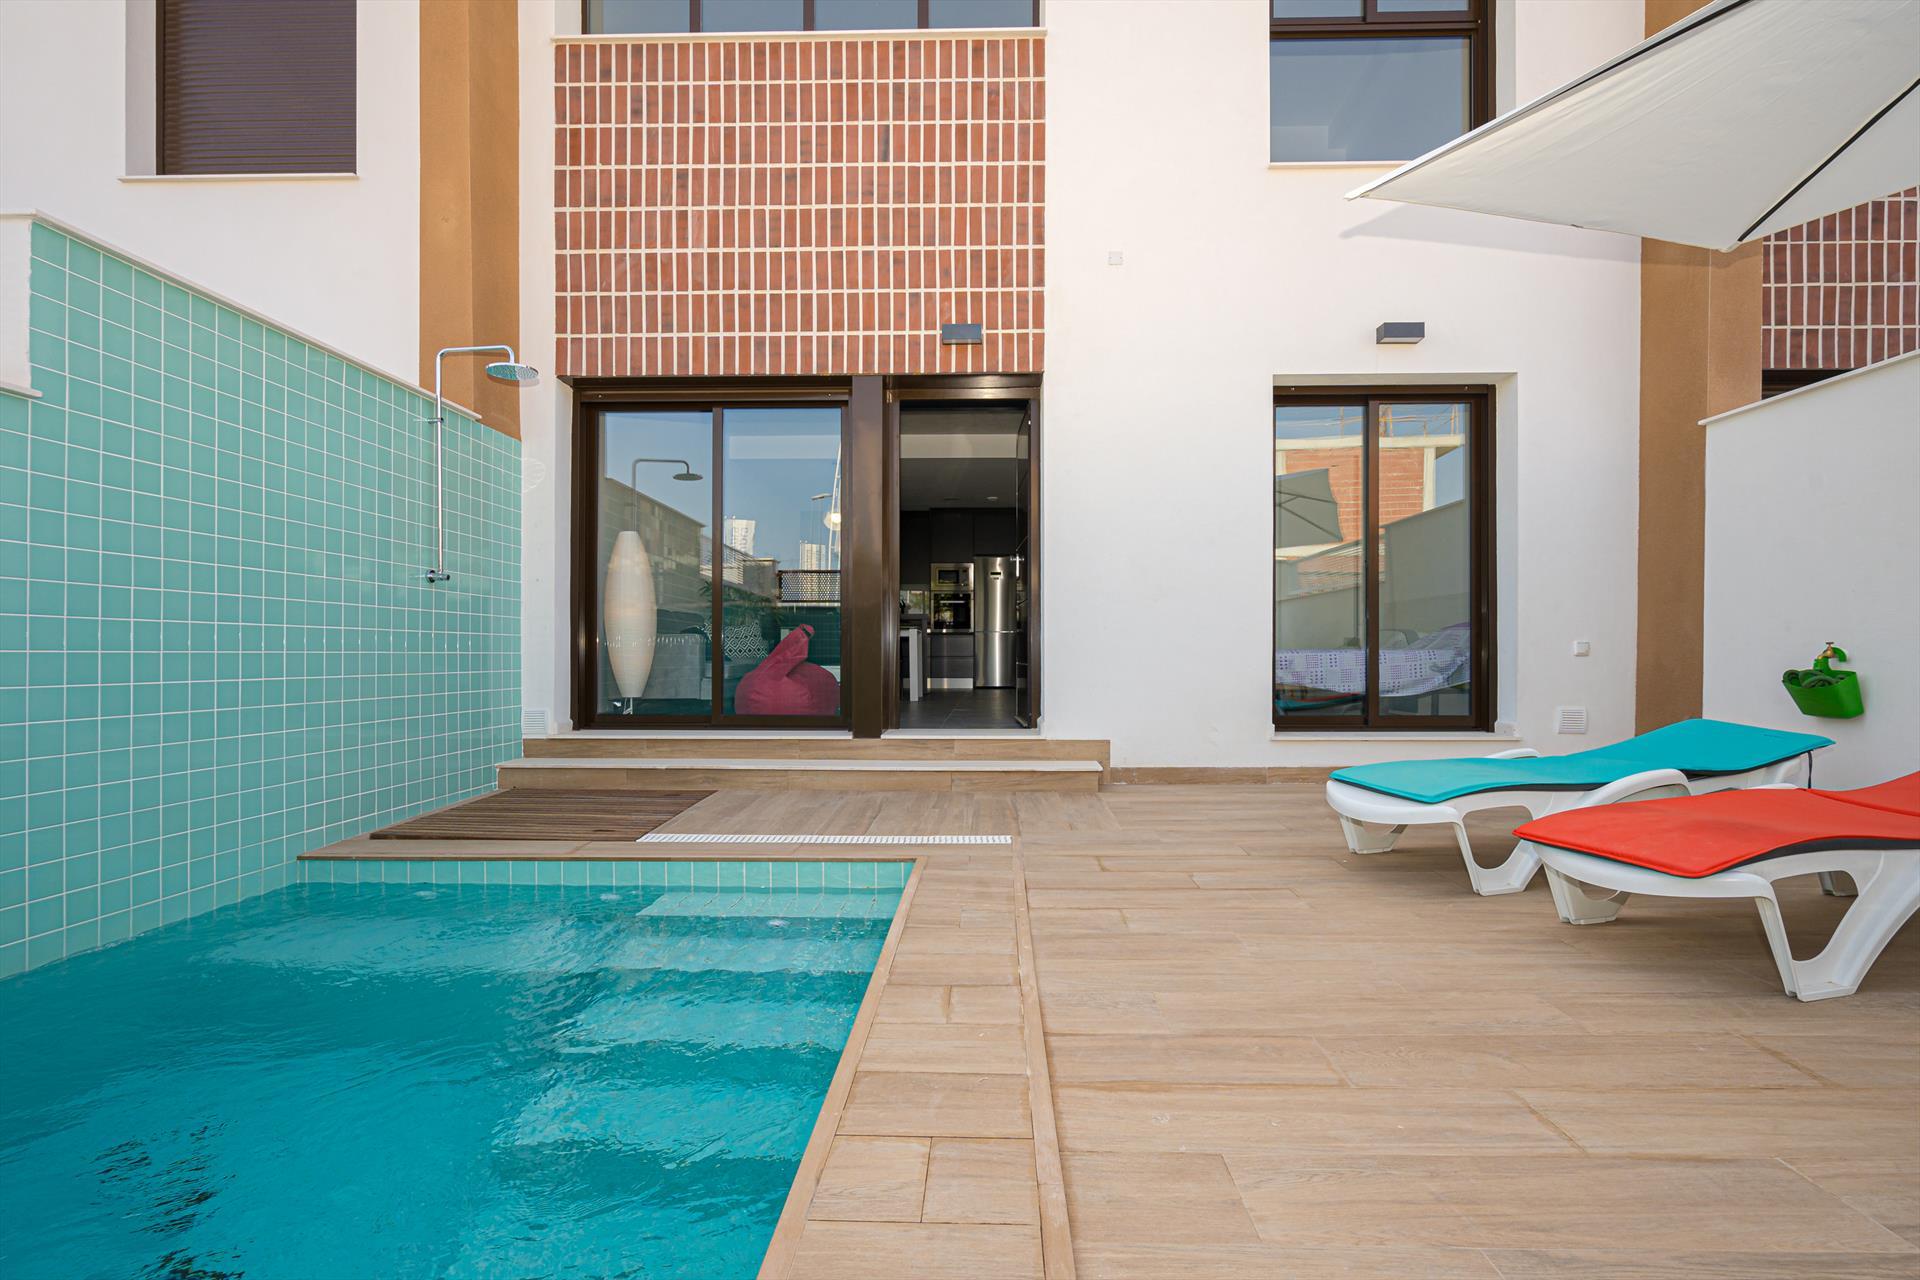 Casa Thai,Modern villa in Pilar de la Horadada, on the Costa Blanca, Spain  with private pool for 6 persons.....